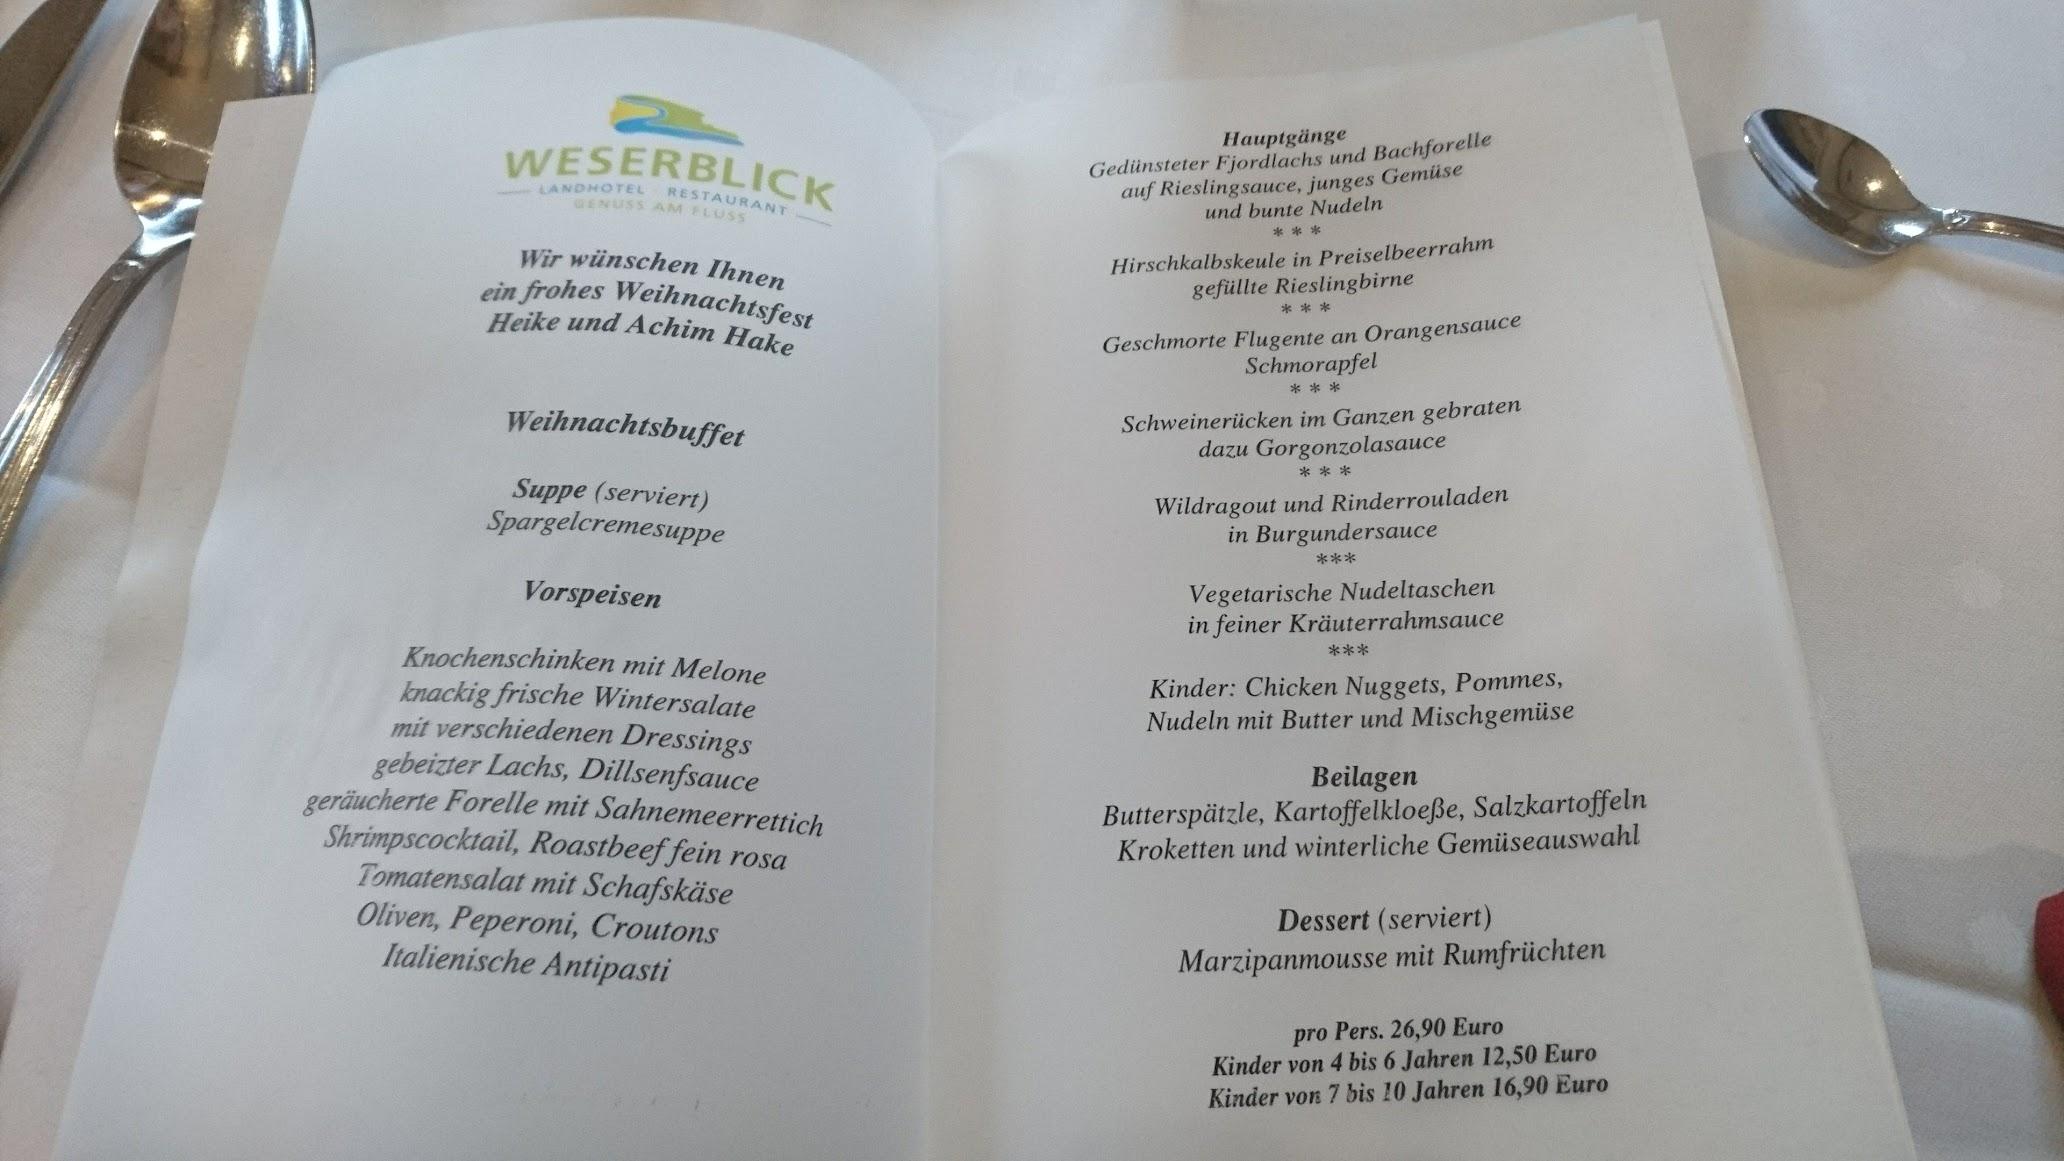 Landhotel Weserblick Blankenau Weihnachtsbuffett Speisekarte